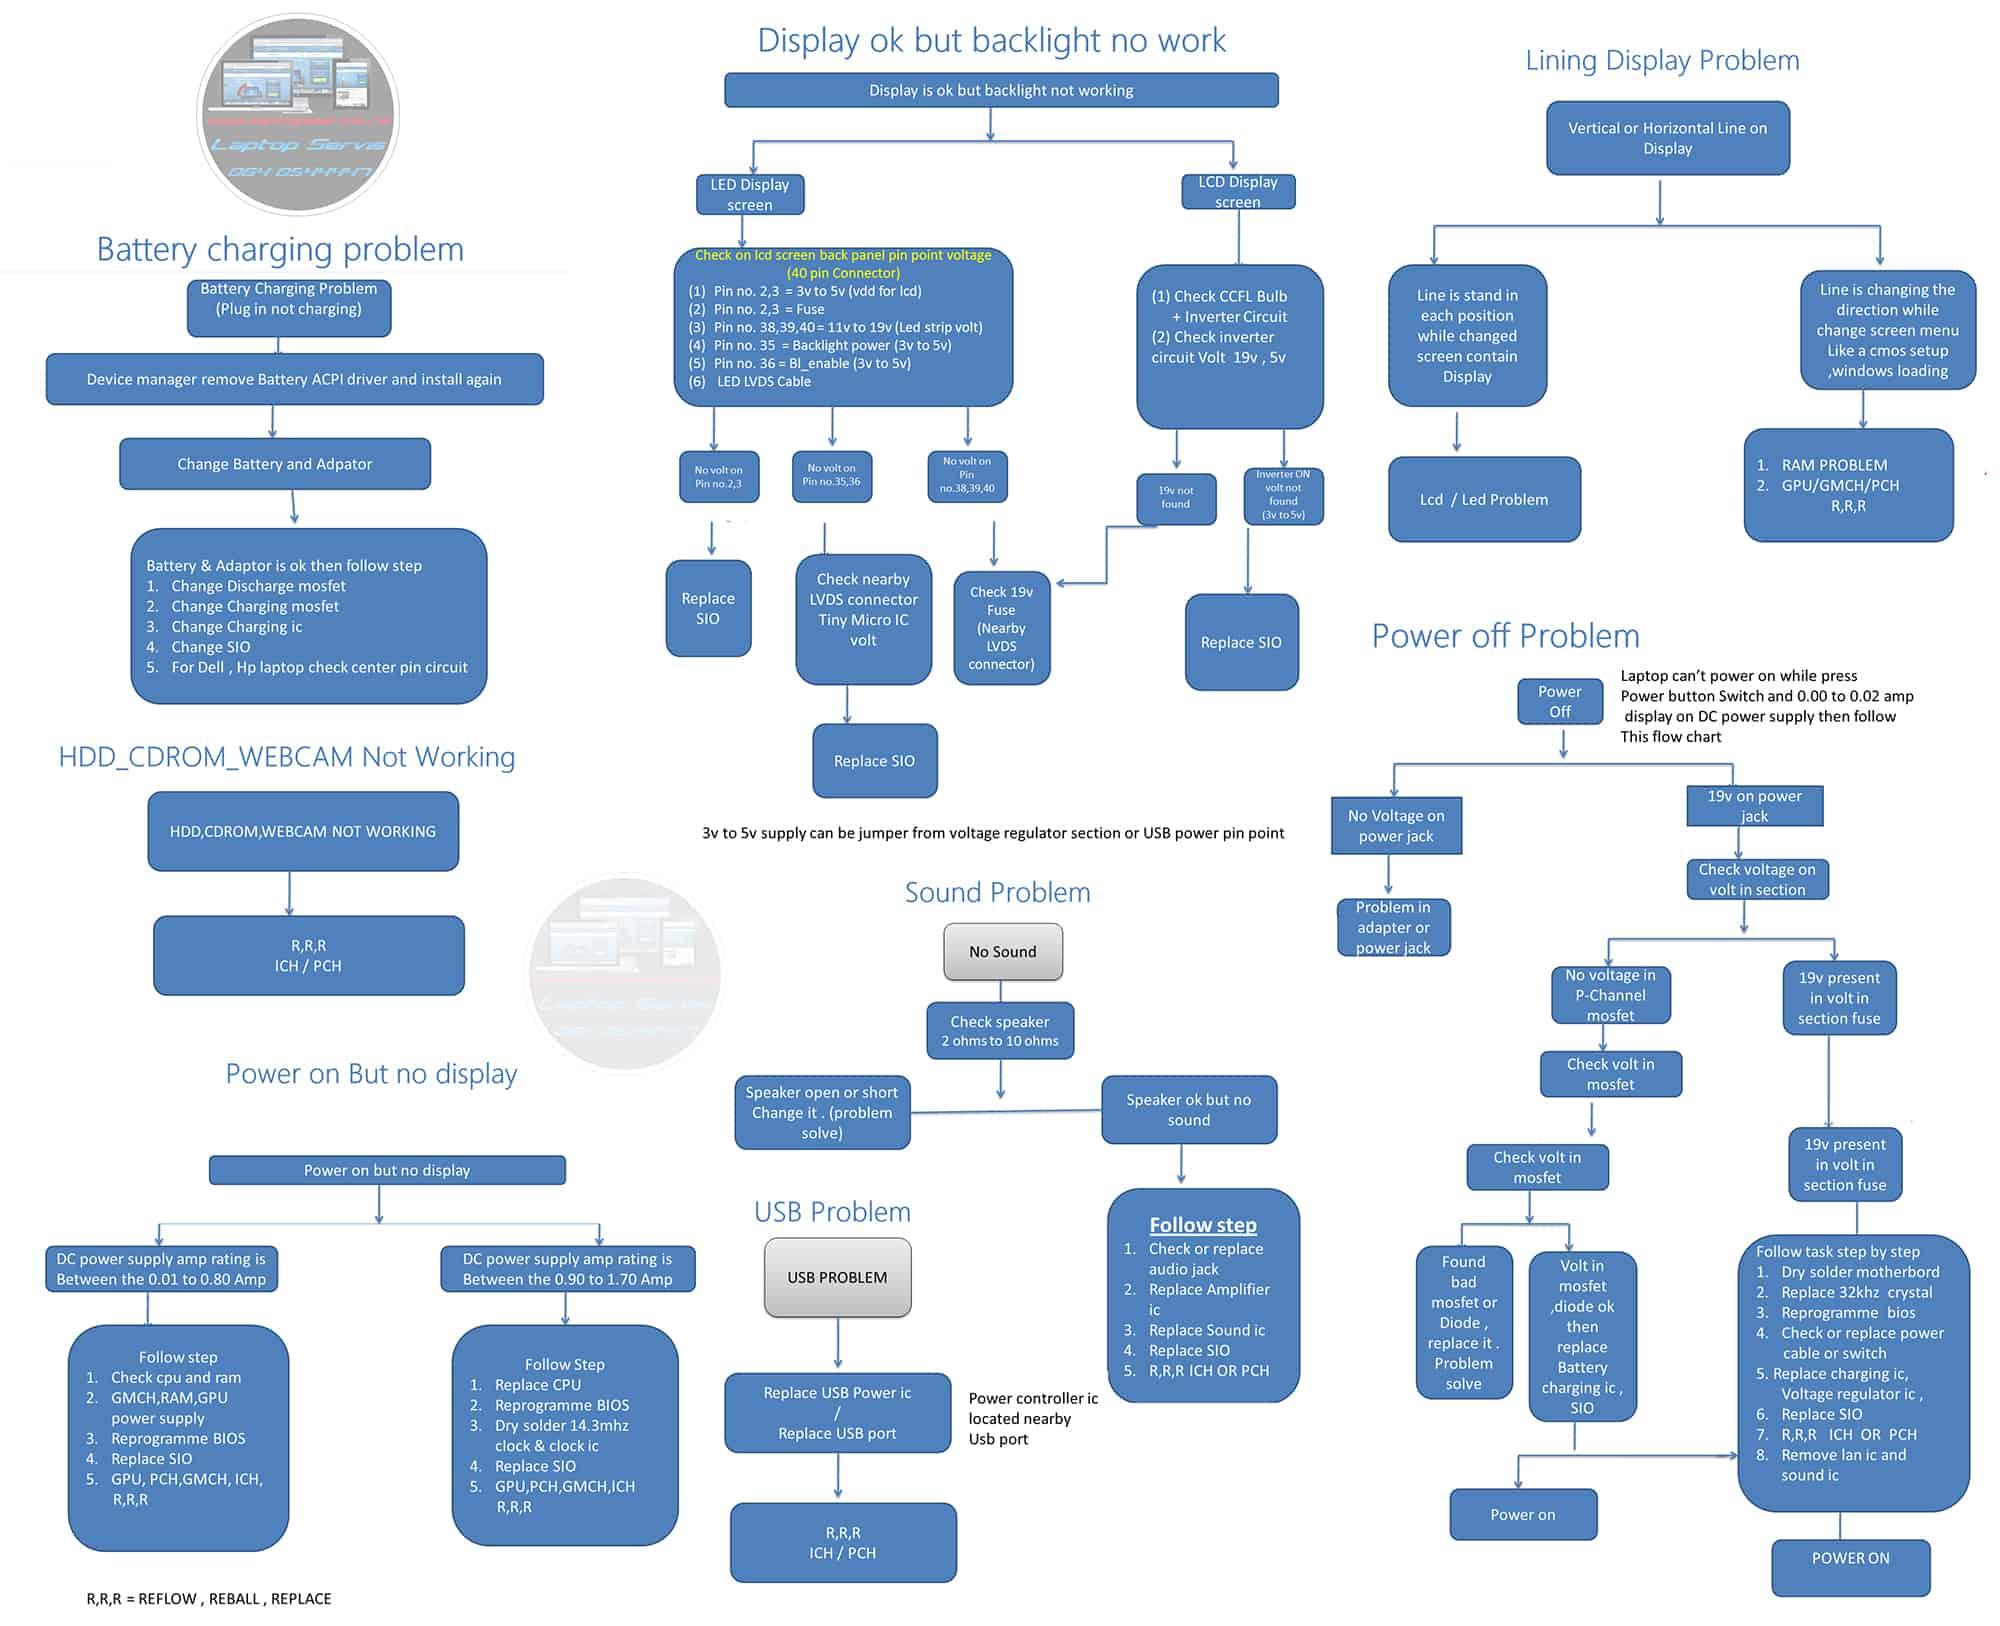 algoritam laptop servis resavanja problema na maticnim plocama